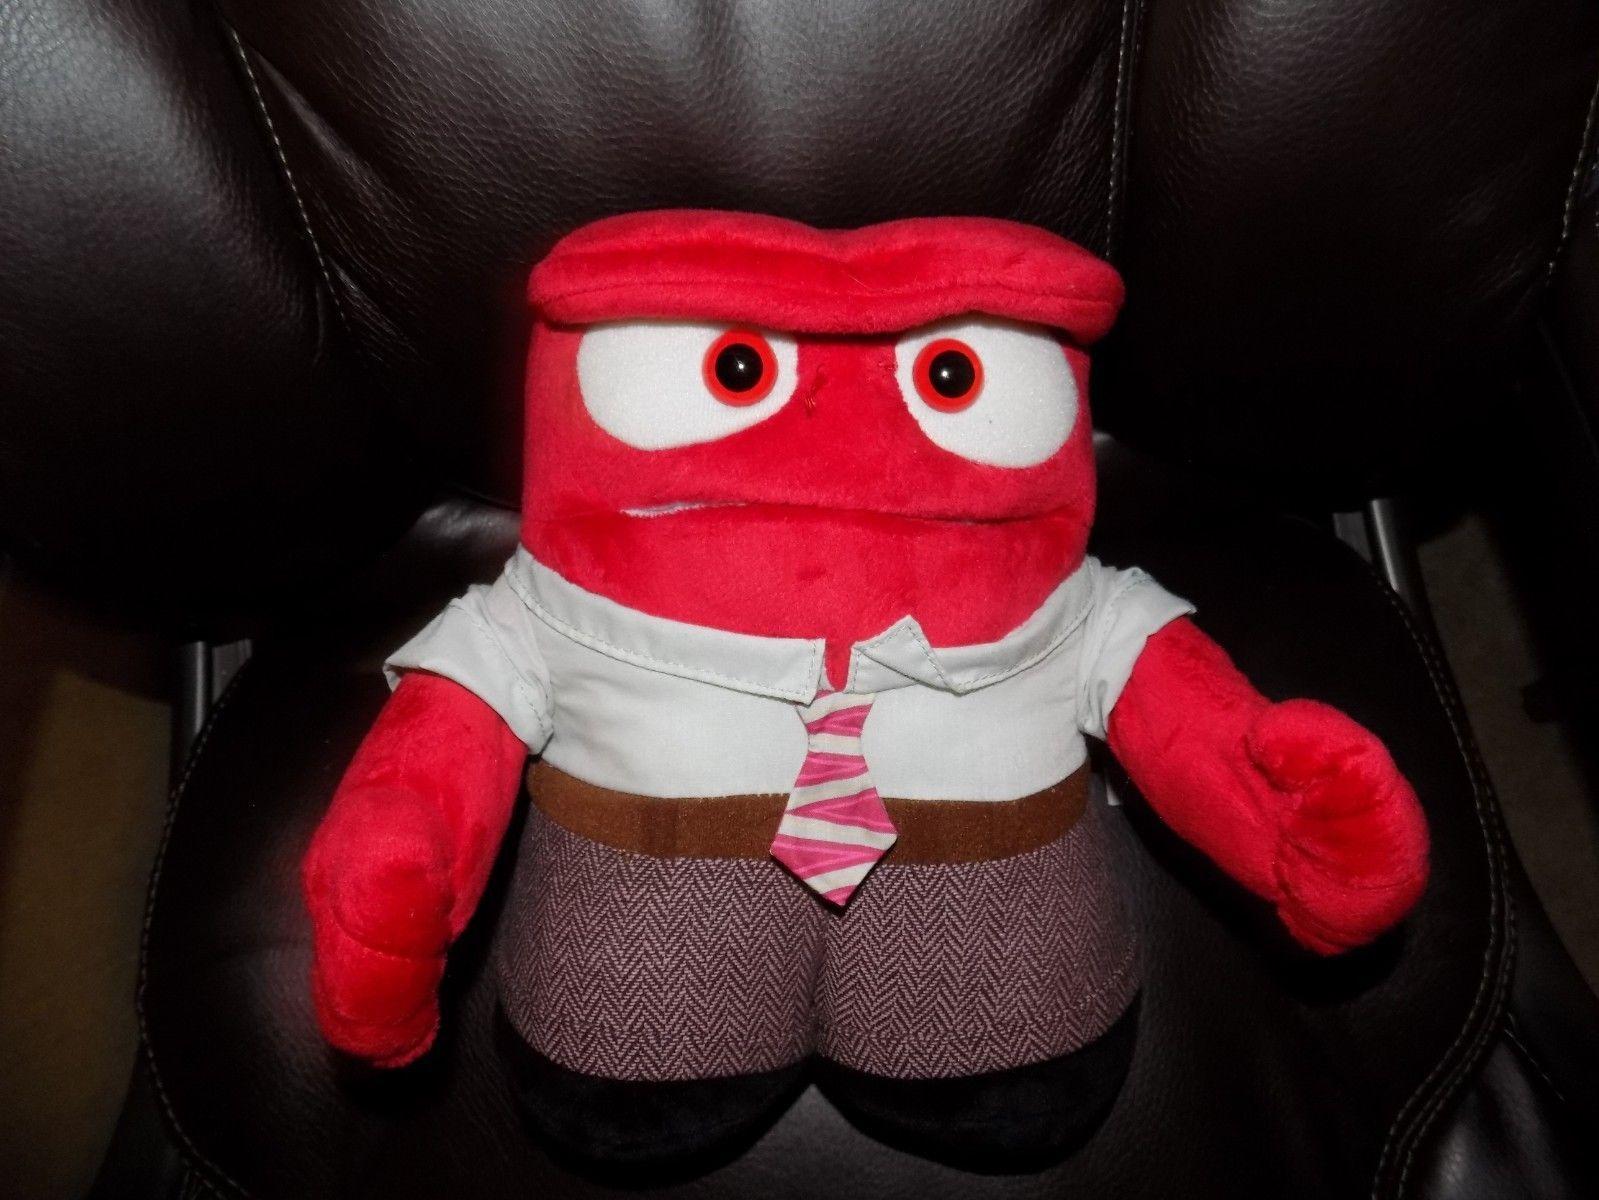 "Animated Talking Anger Doll Disney/Pixar Inside Out Plush 10"" EUC"